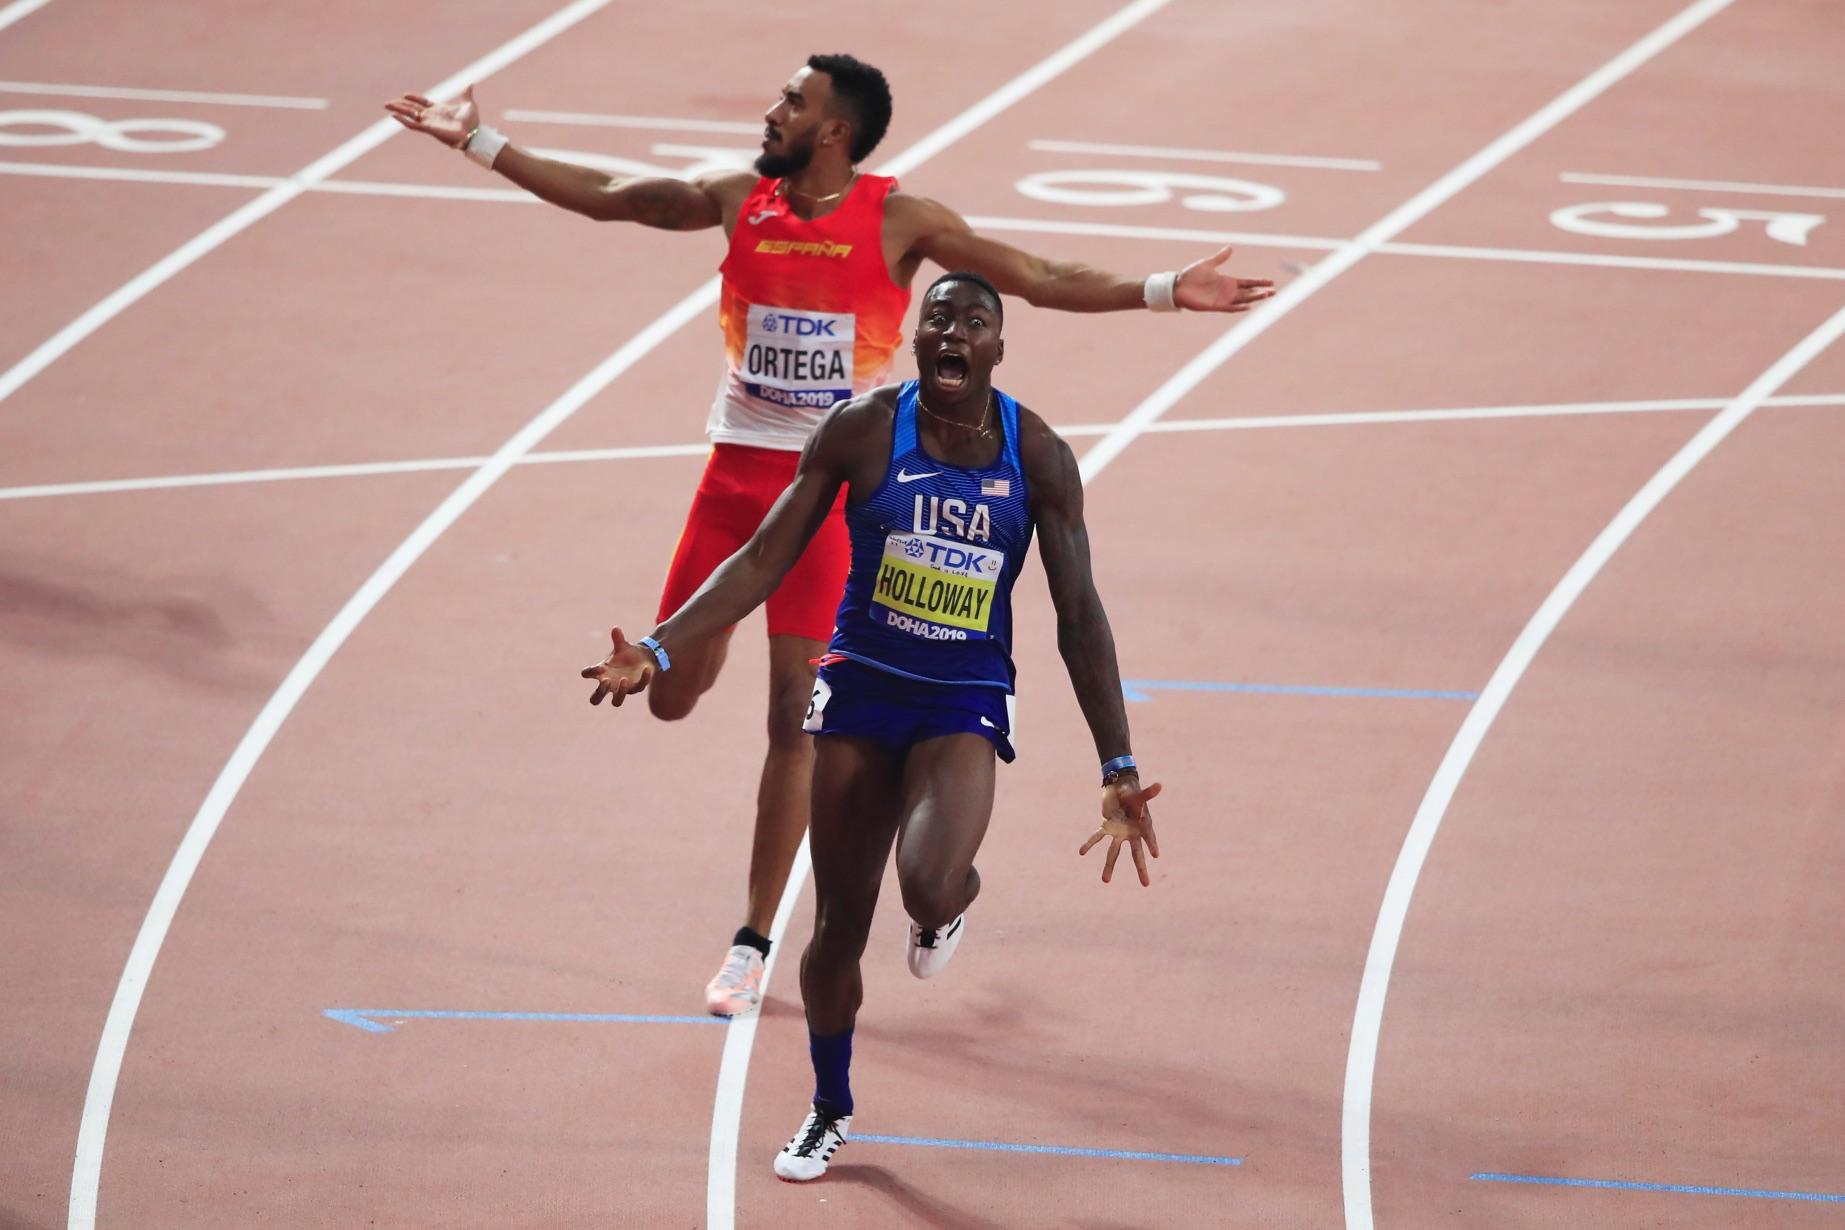 17th IAAF World Athletics Championships Doha 2019 - Day Six - Runner's Tribe